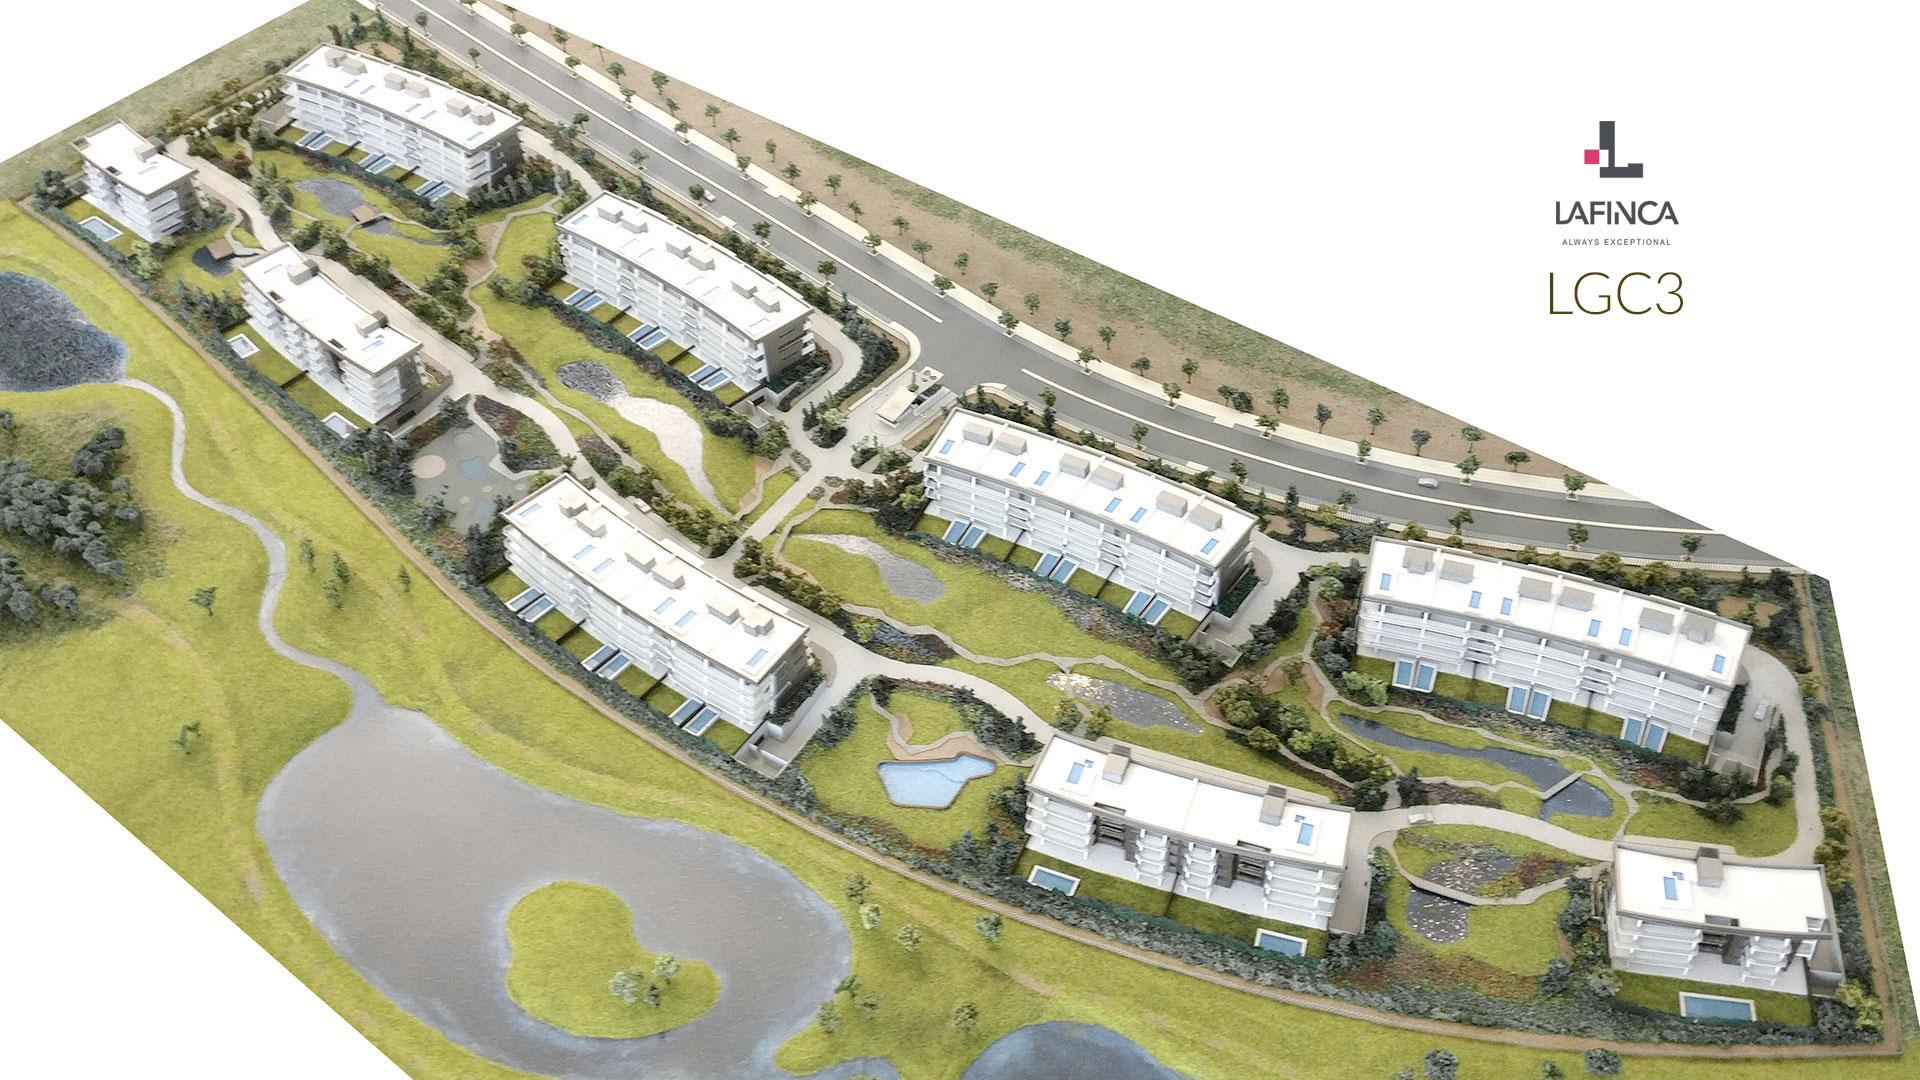 Urbanización LAFINCA LGC3